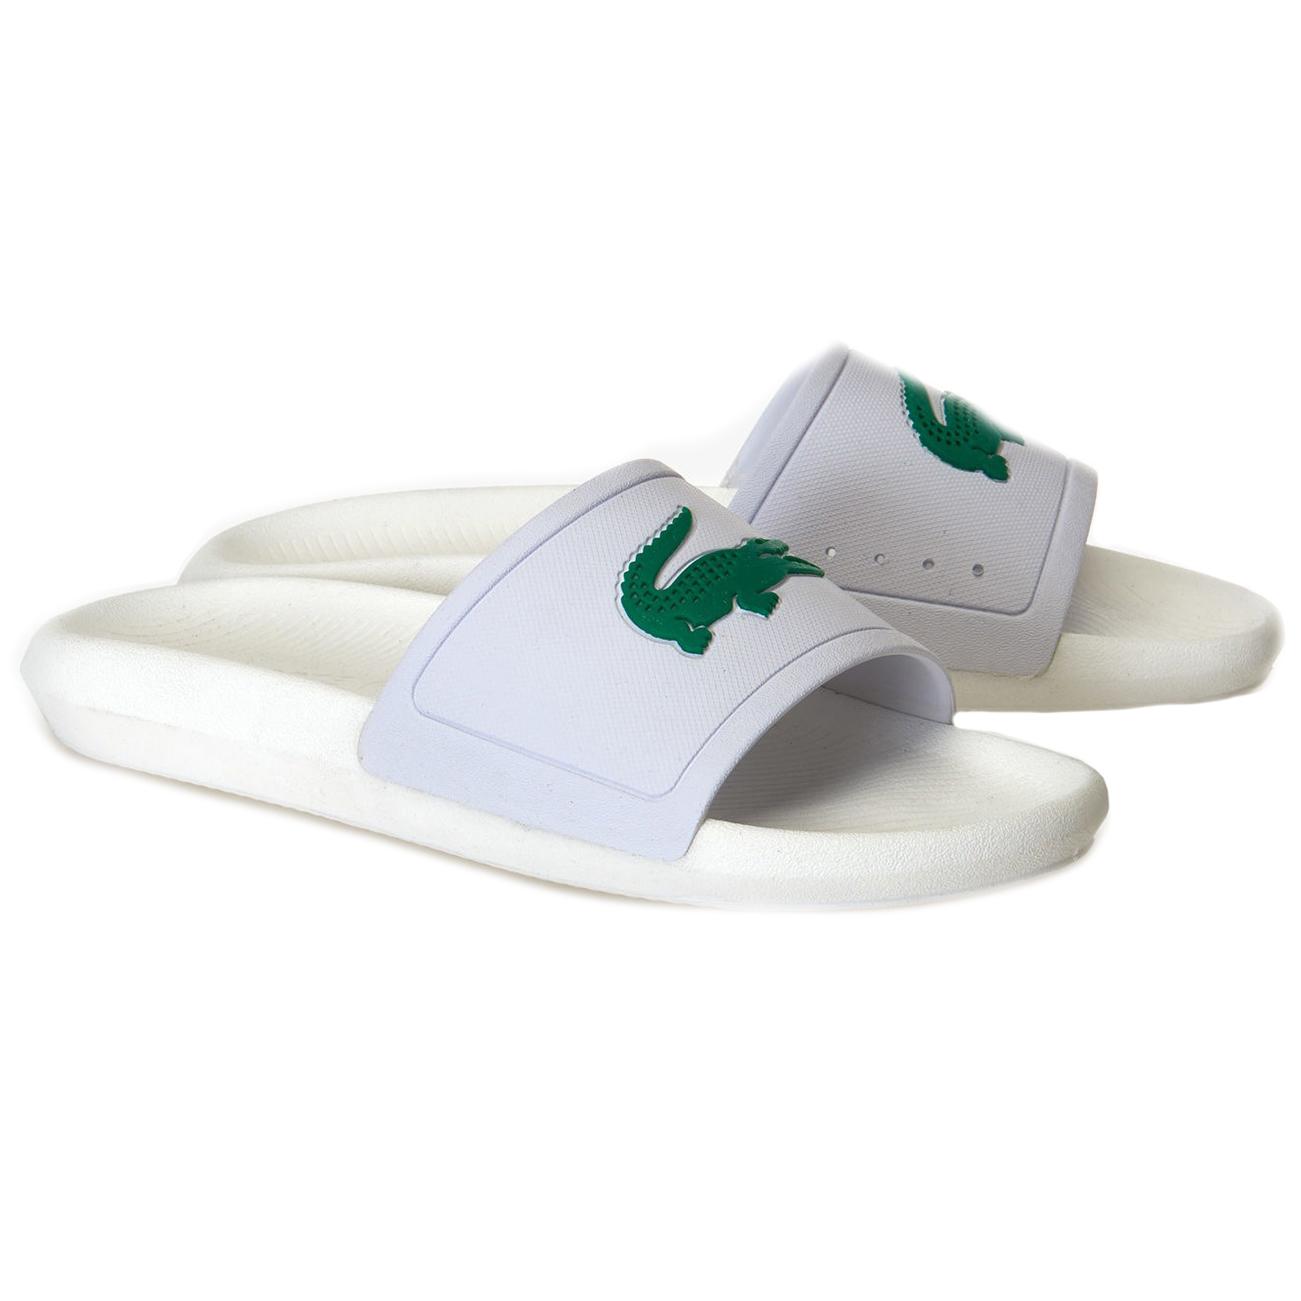 Womens Lacoste Croco Slide 119 3 Lightweight Beach Summer Sliders Sandals UK 3-8